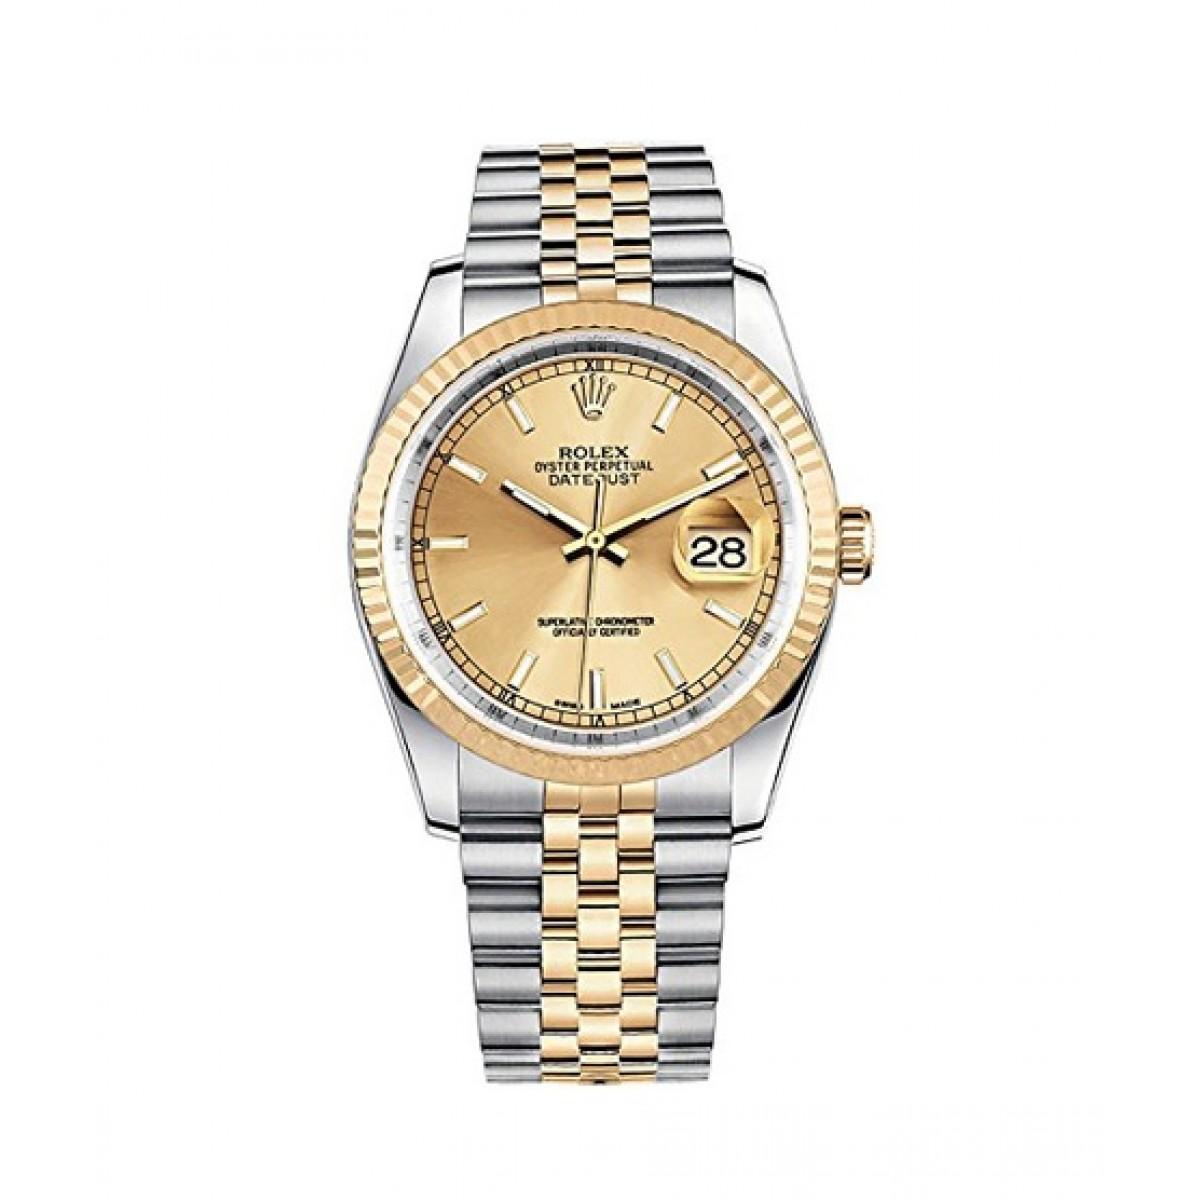 Rolex Datejust 36 Men\u0027s Watch Yellow Gold (116233,GLDSJ)